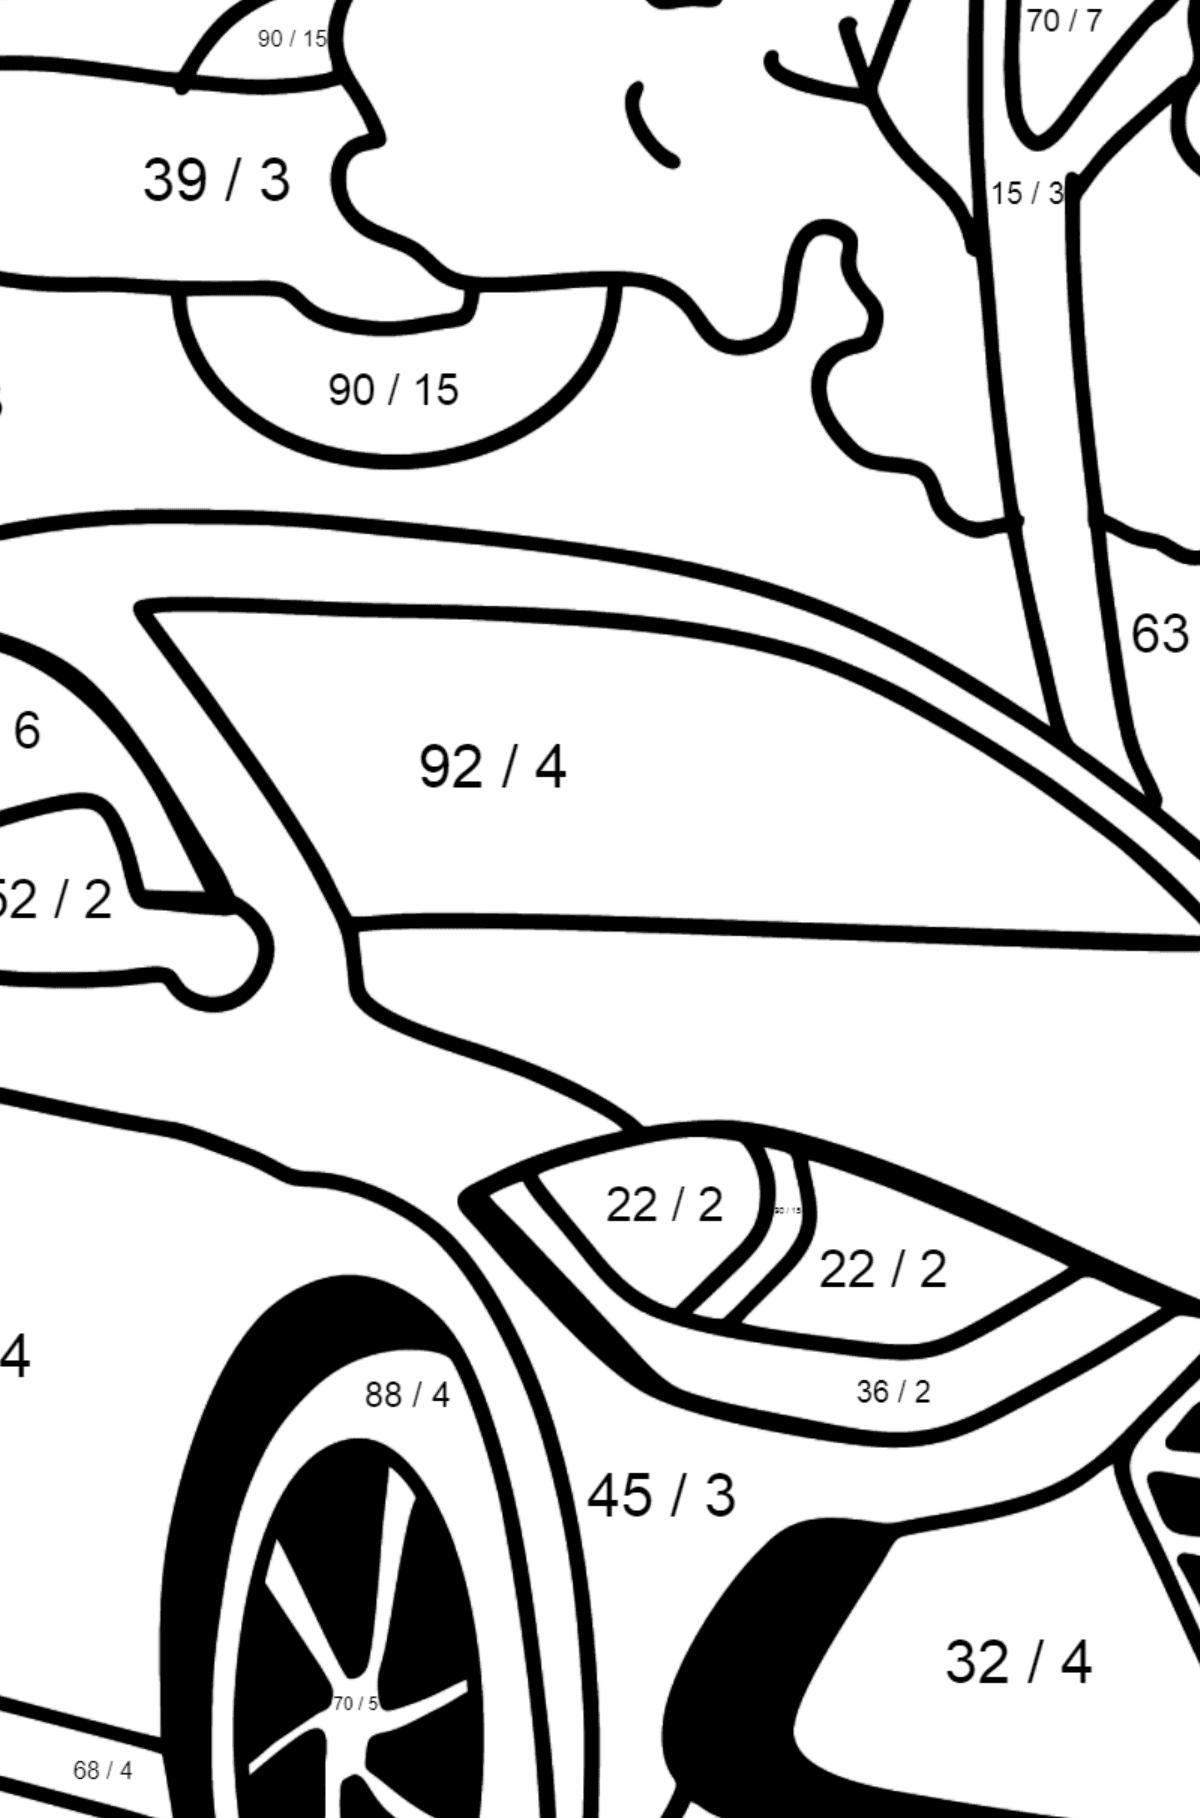 Hyundai car coloring page - Math Coloring - Division for Kids